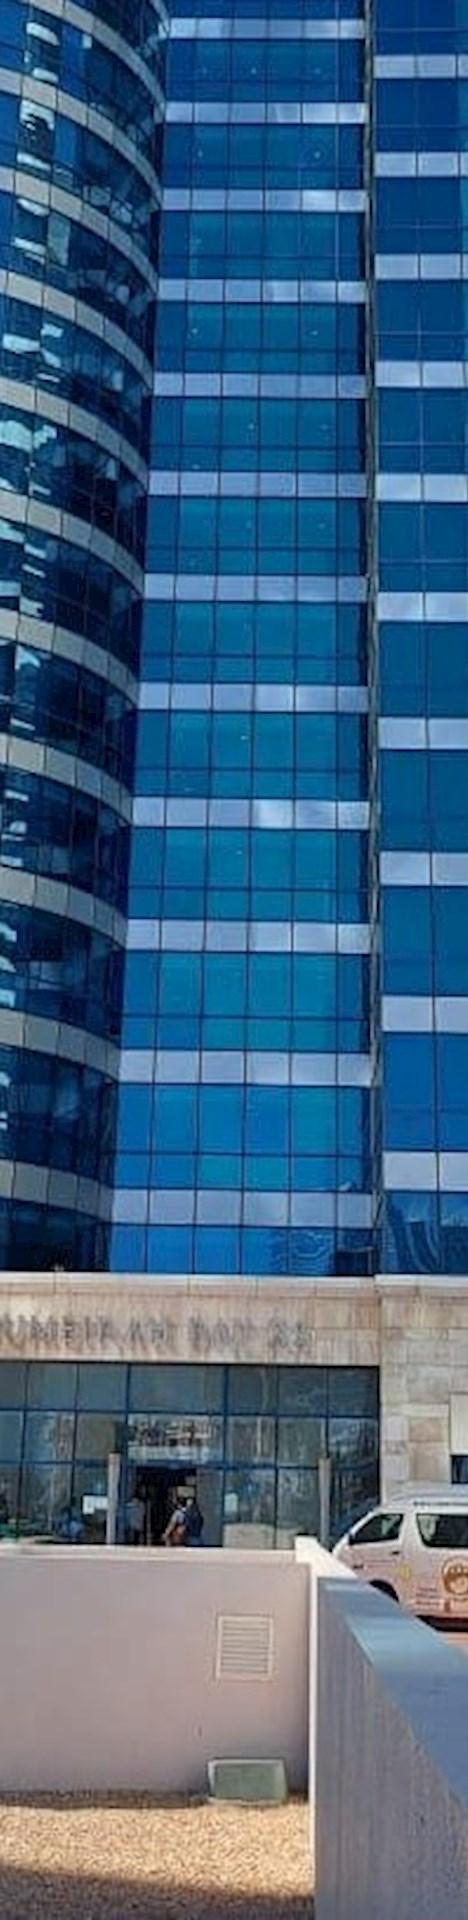 Office building in Dubai